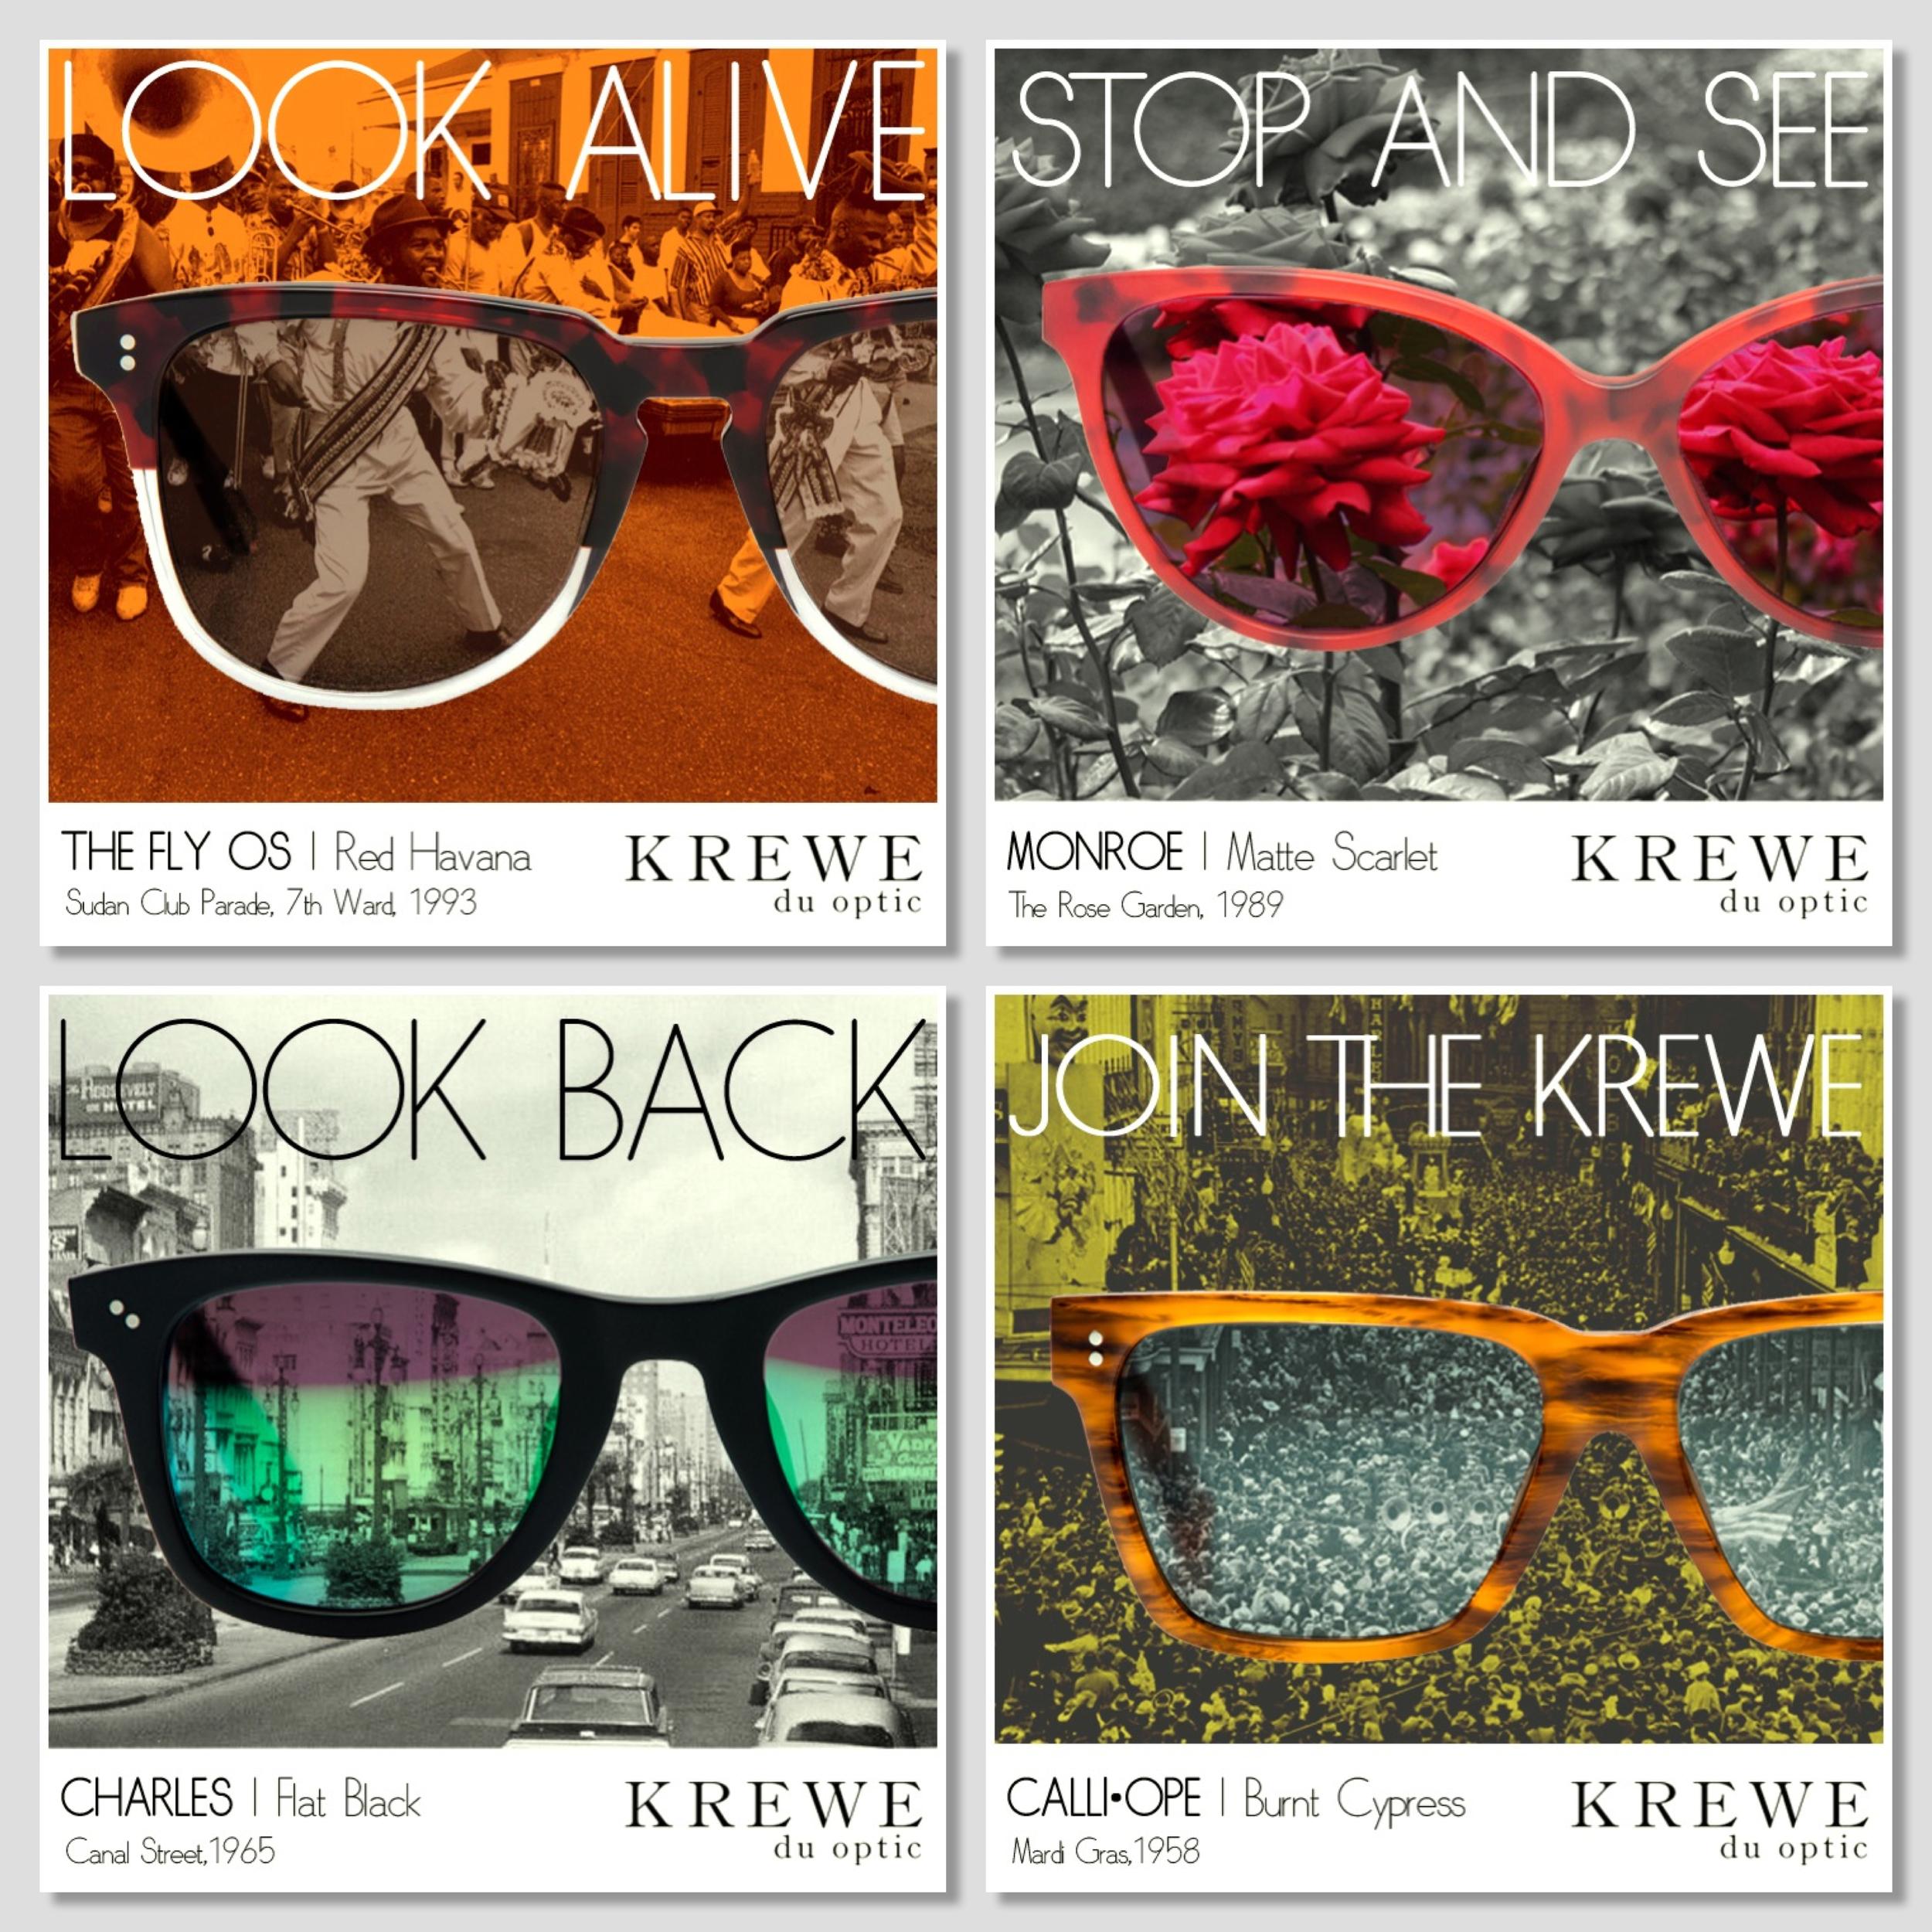 Social Media Campaign Concept for Krewe du optic